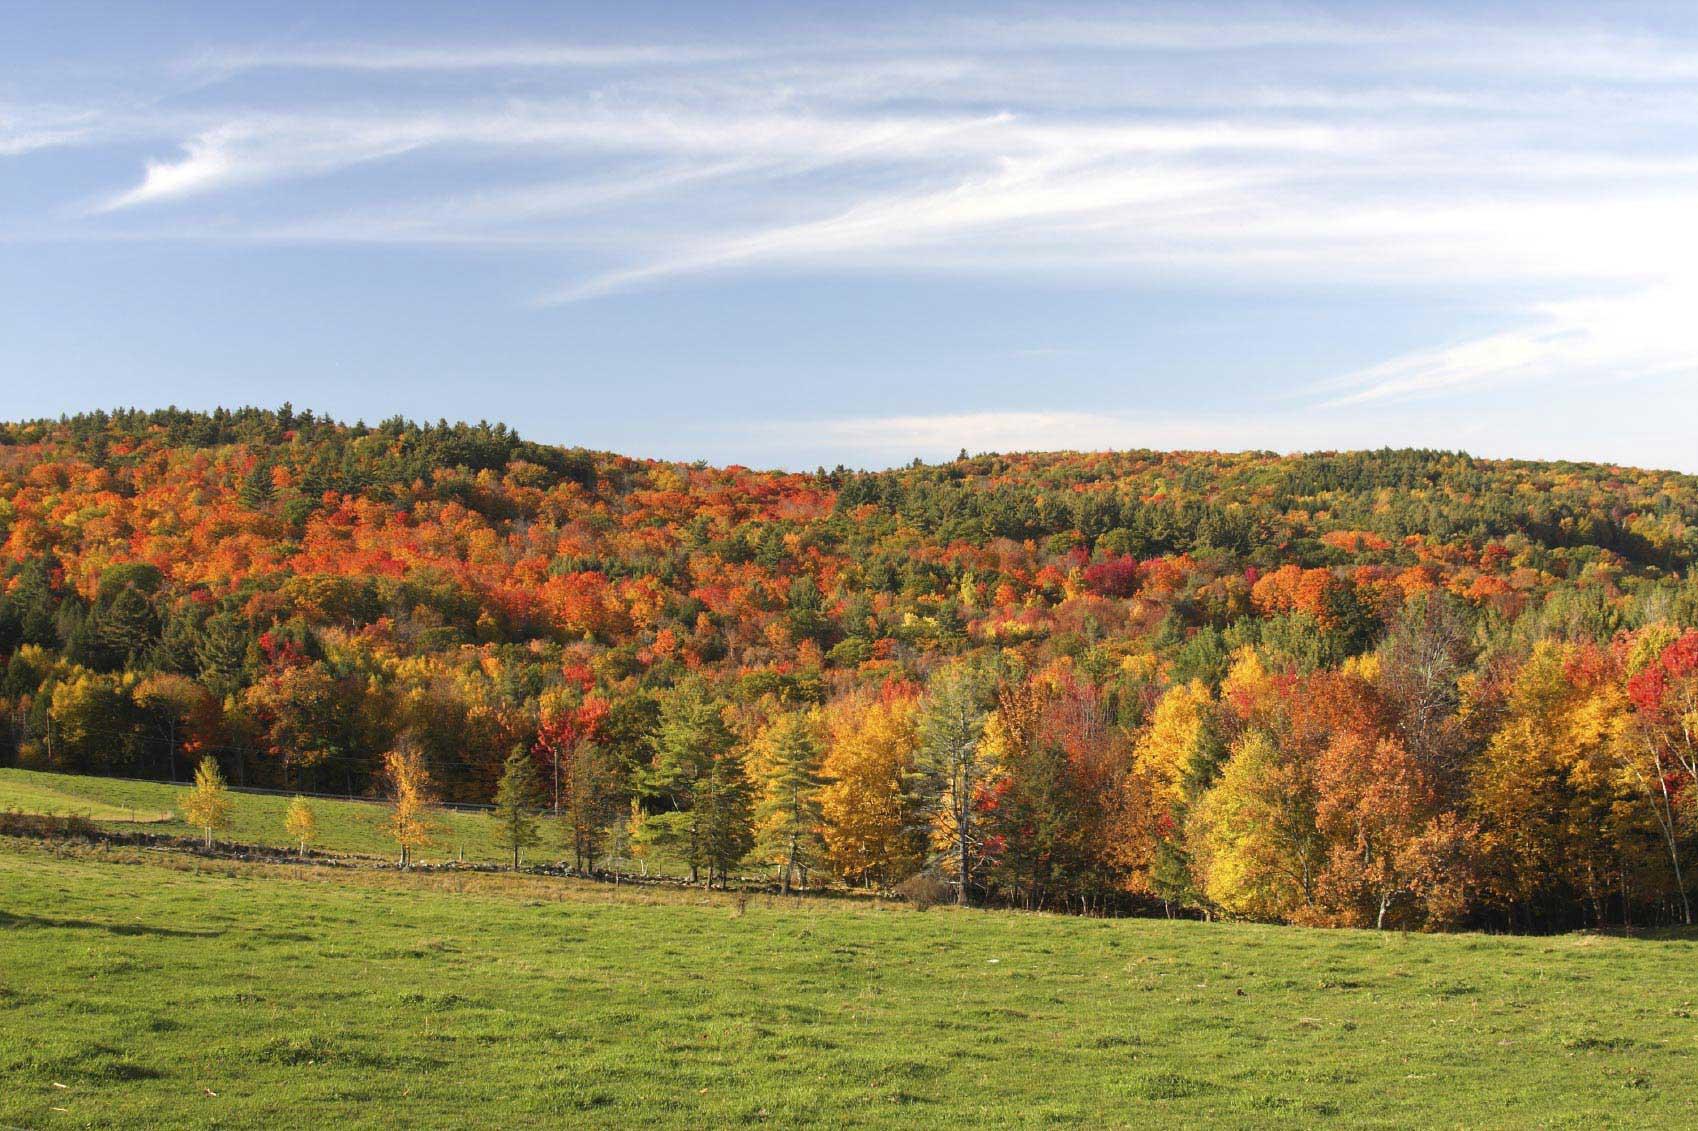 Farbenfrohe Landschaftenfotografieren